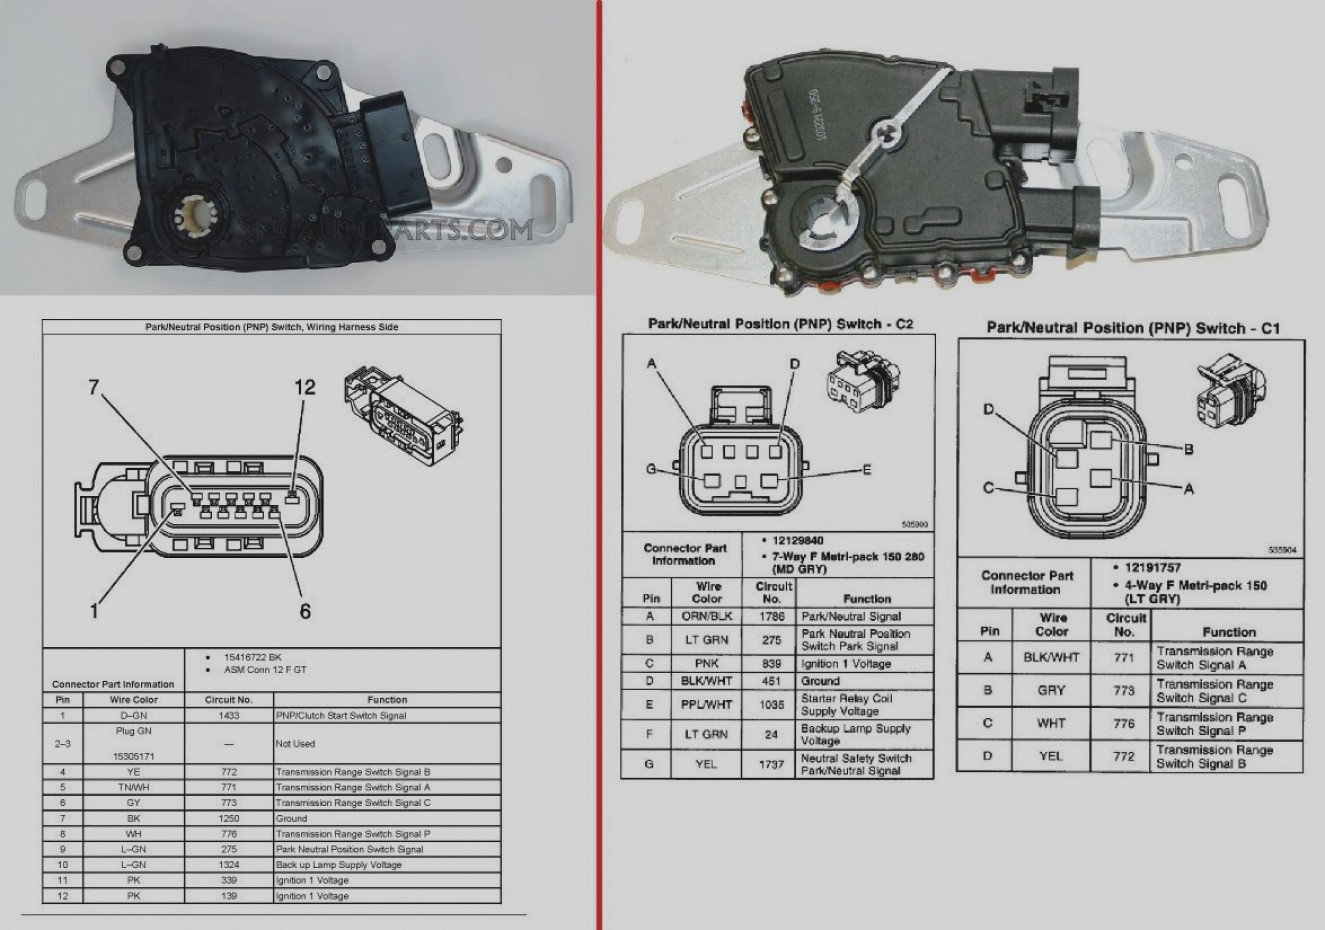 Neutral Safety Relay Wiring Diagram | Wiring Library - Neutral Safety Switch Wiring Diagram Chevy